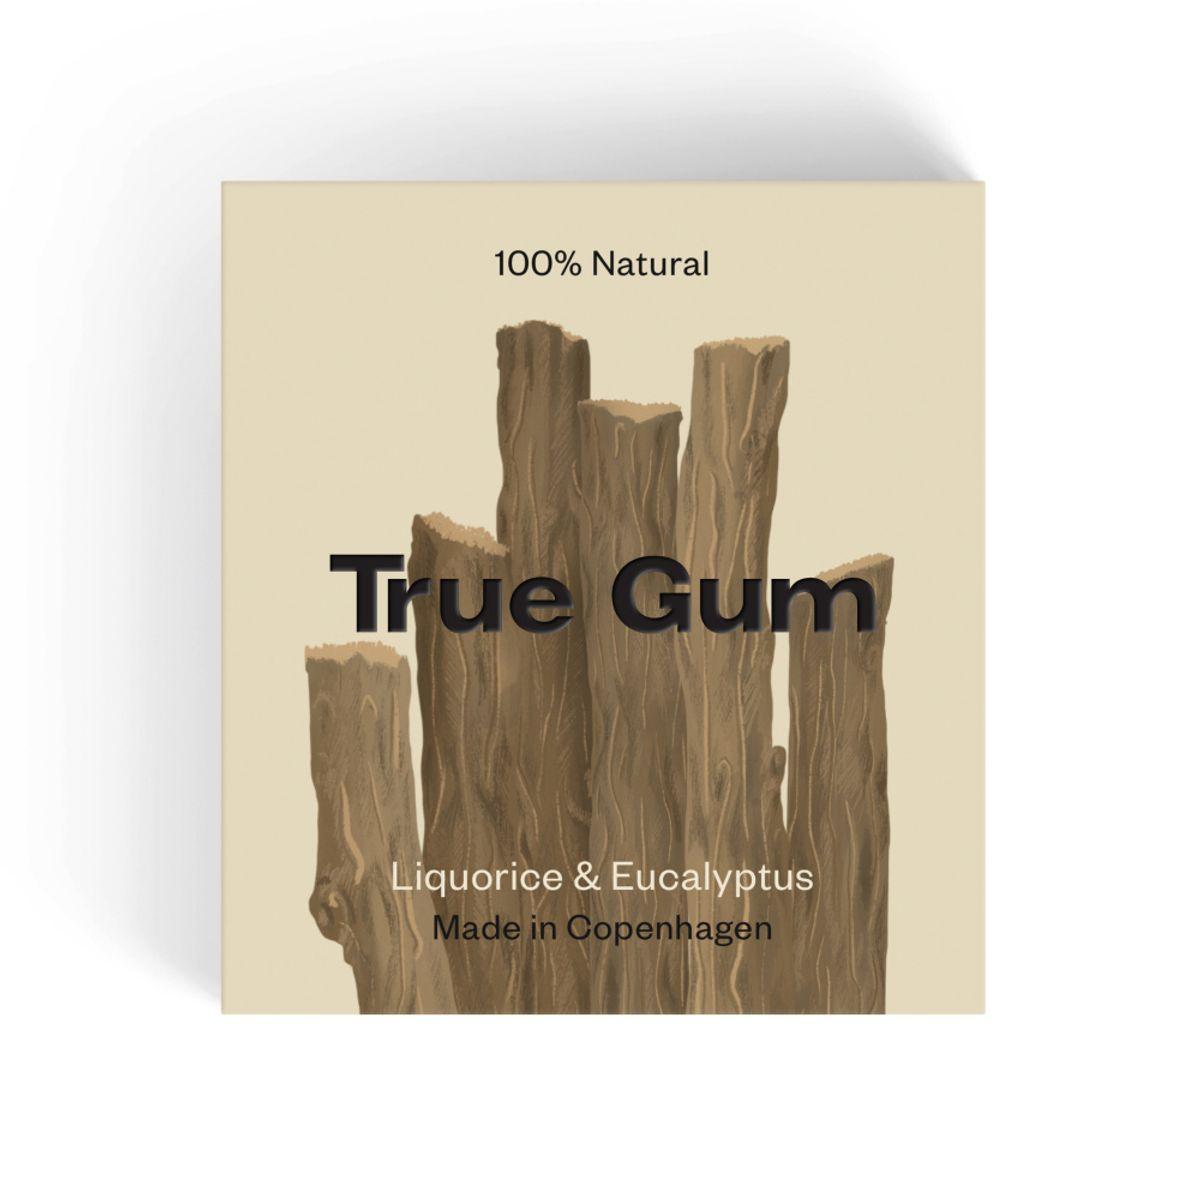 True Gum lakris & eukalyptus tyggegummi 21 gr